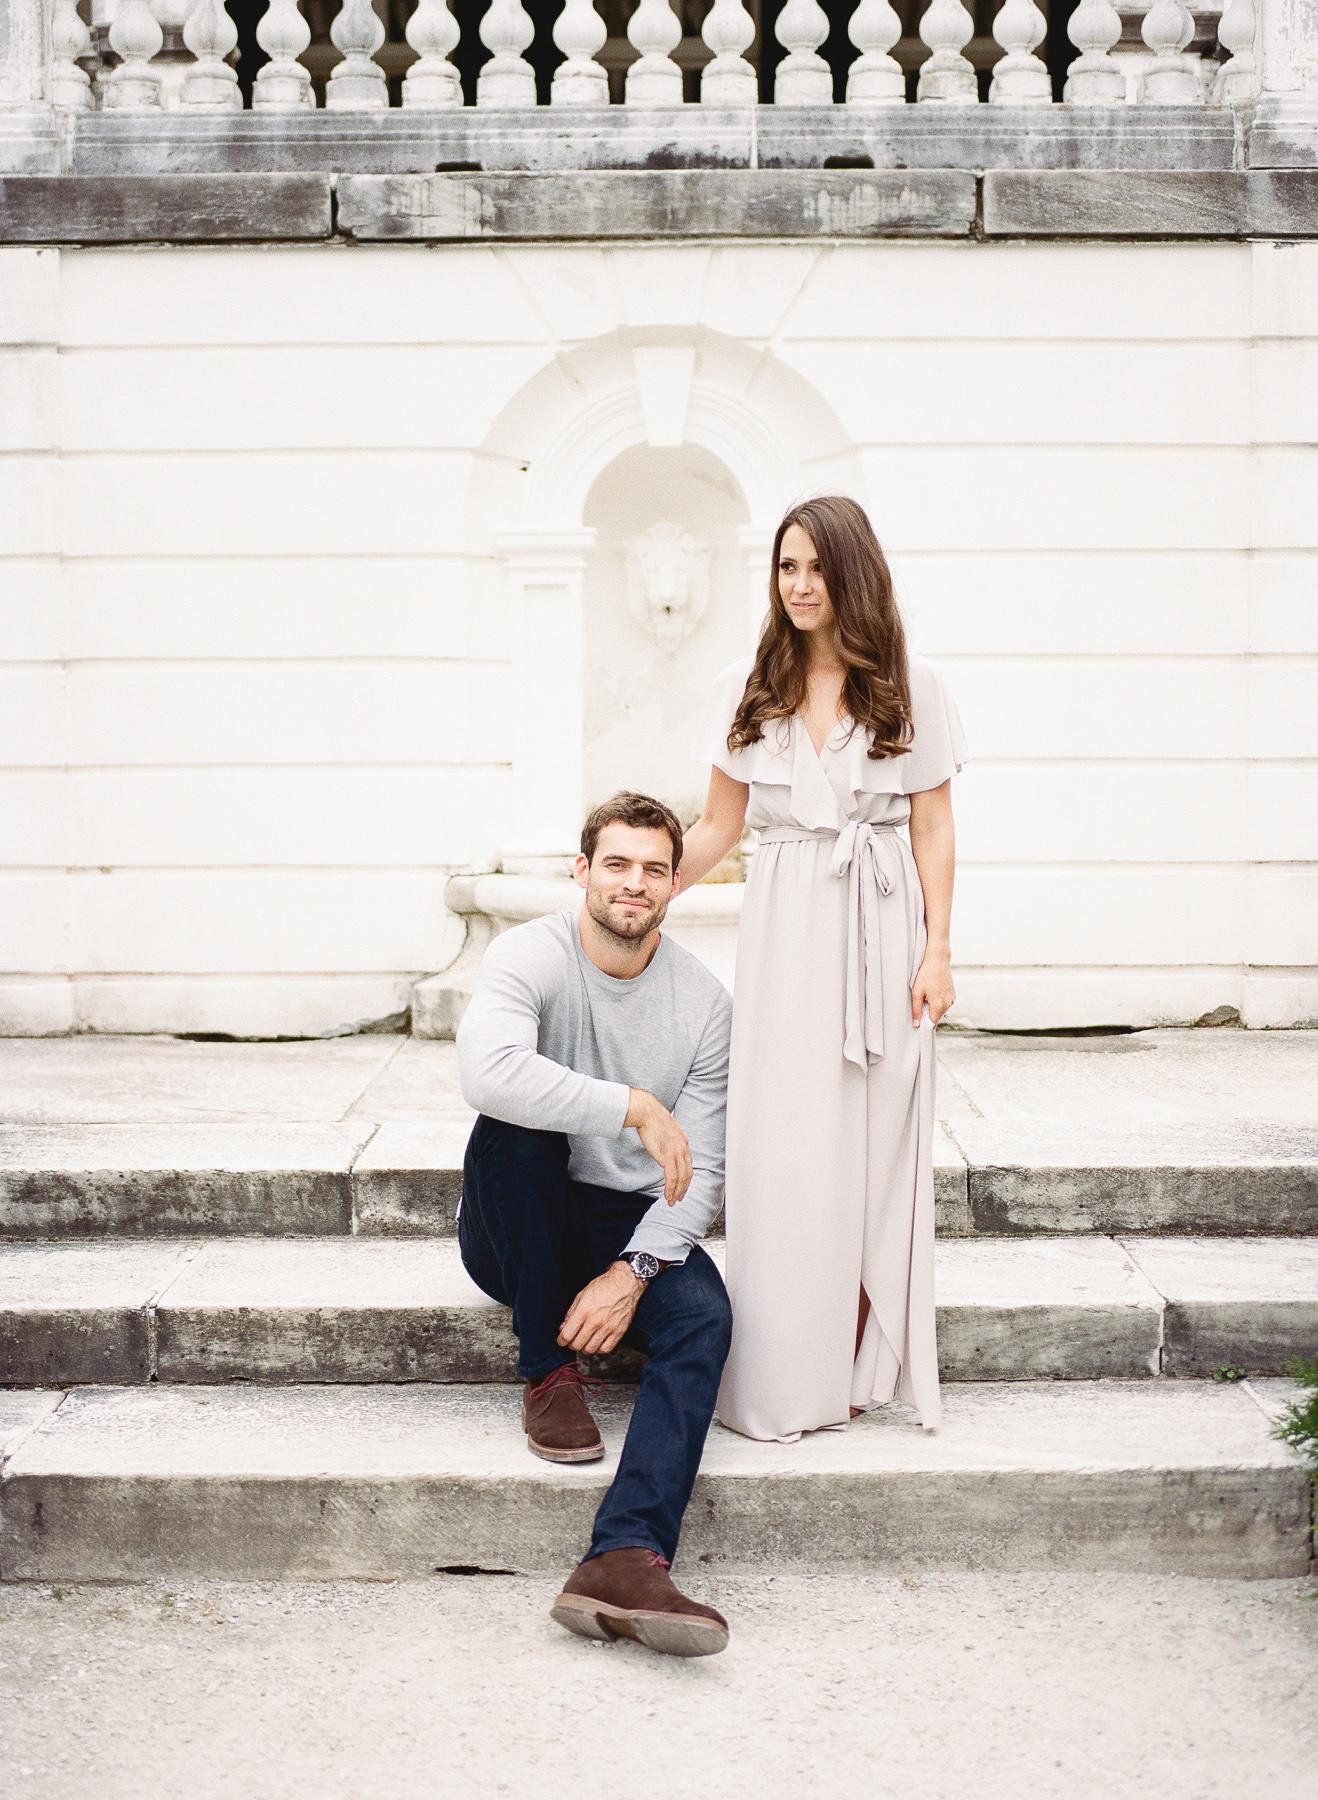 The Mount Lenox MA Engagement and Wedding Photographer